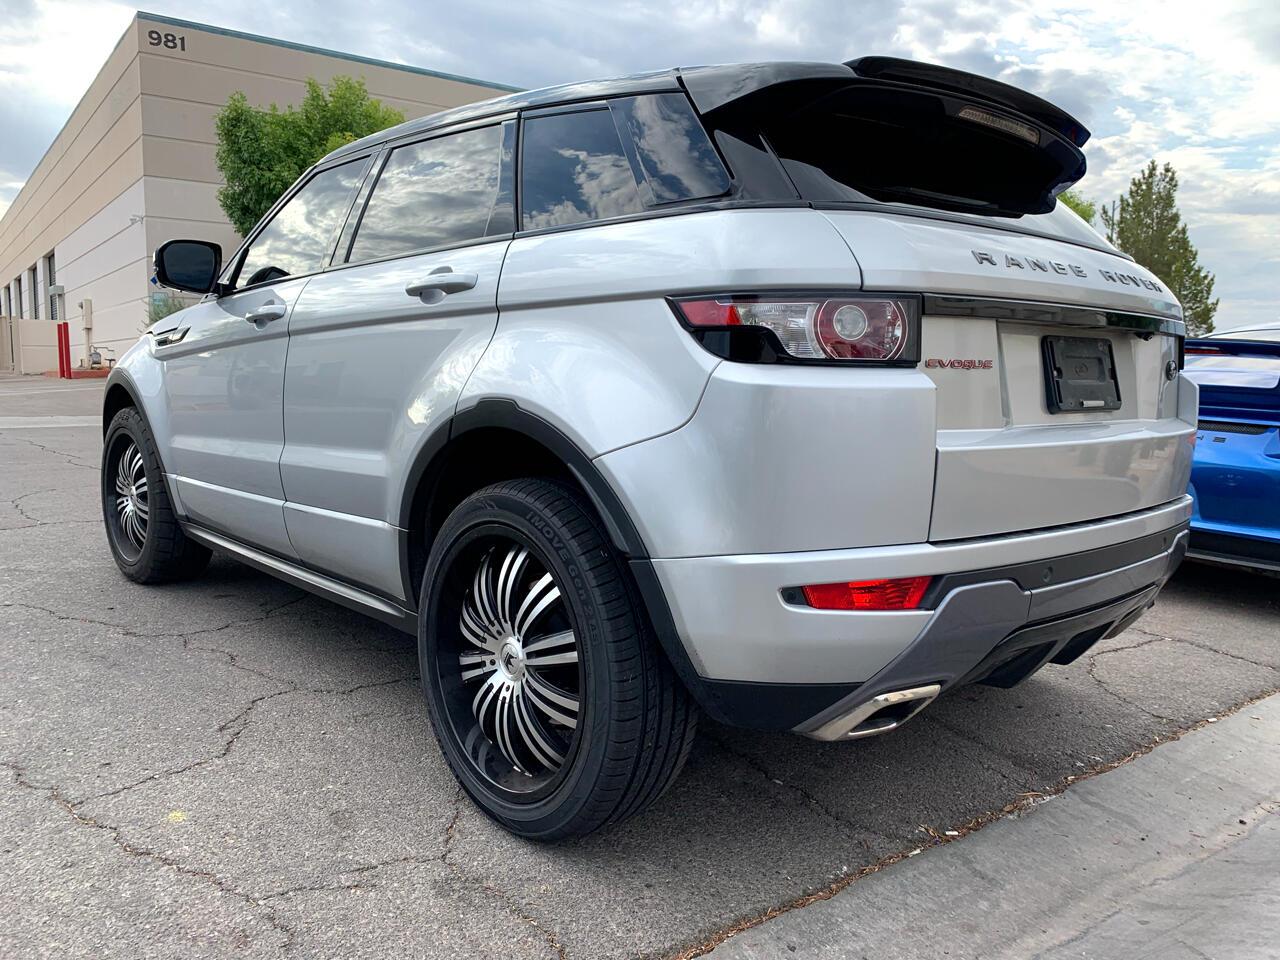 2012 Land Rover Range Rover Evoque 5dr HB Dynamic Premium